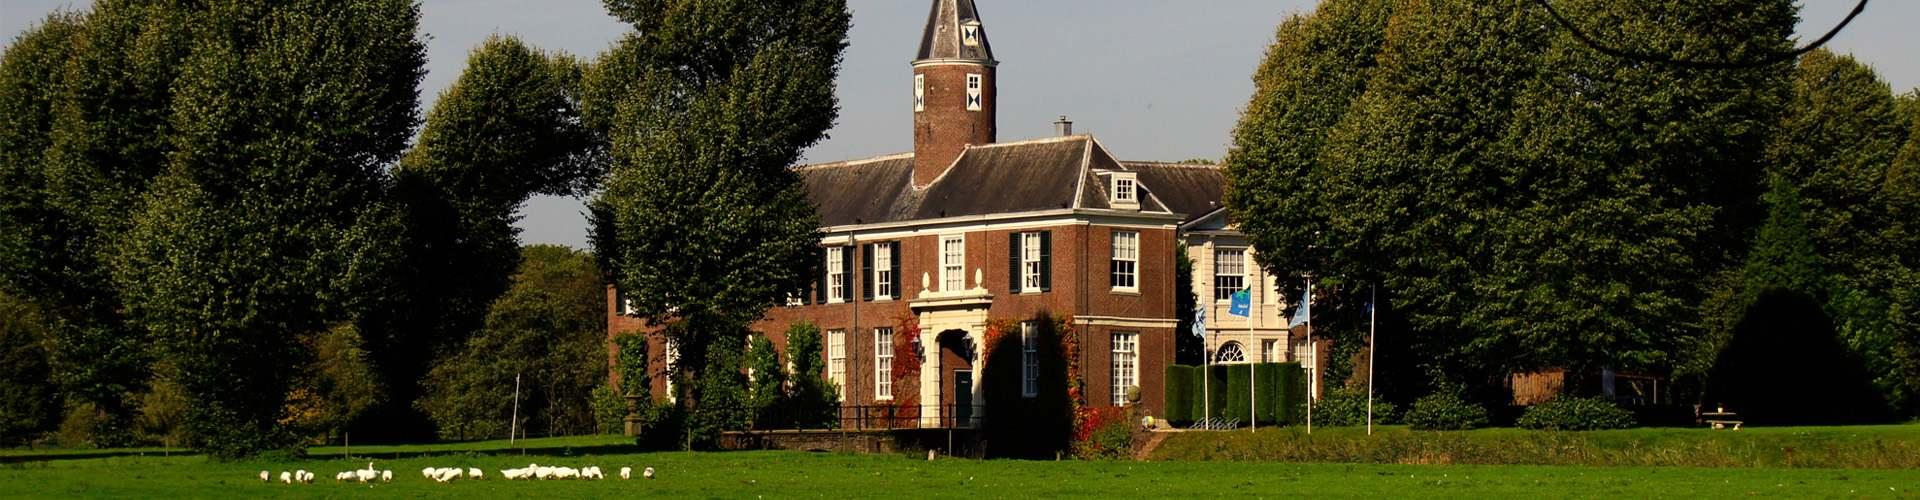 Chateau Marquette_Heemskerk